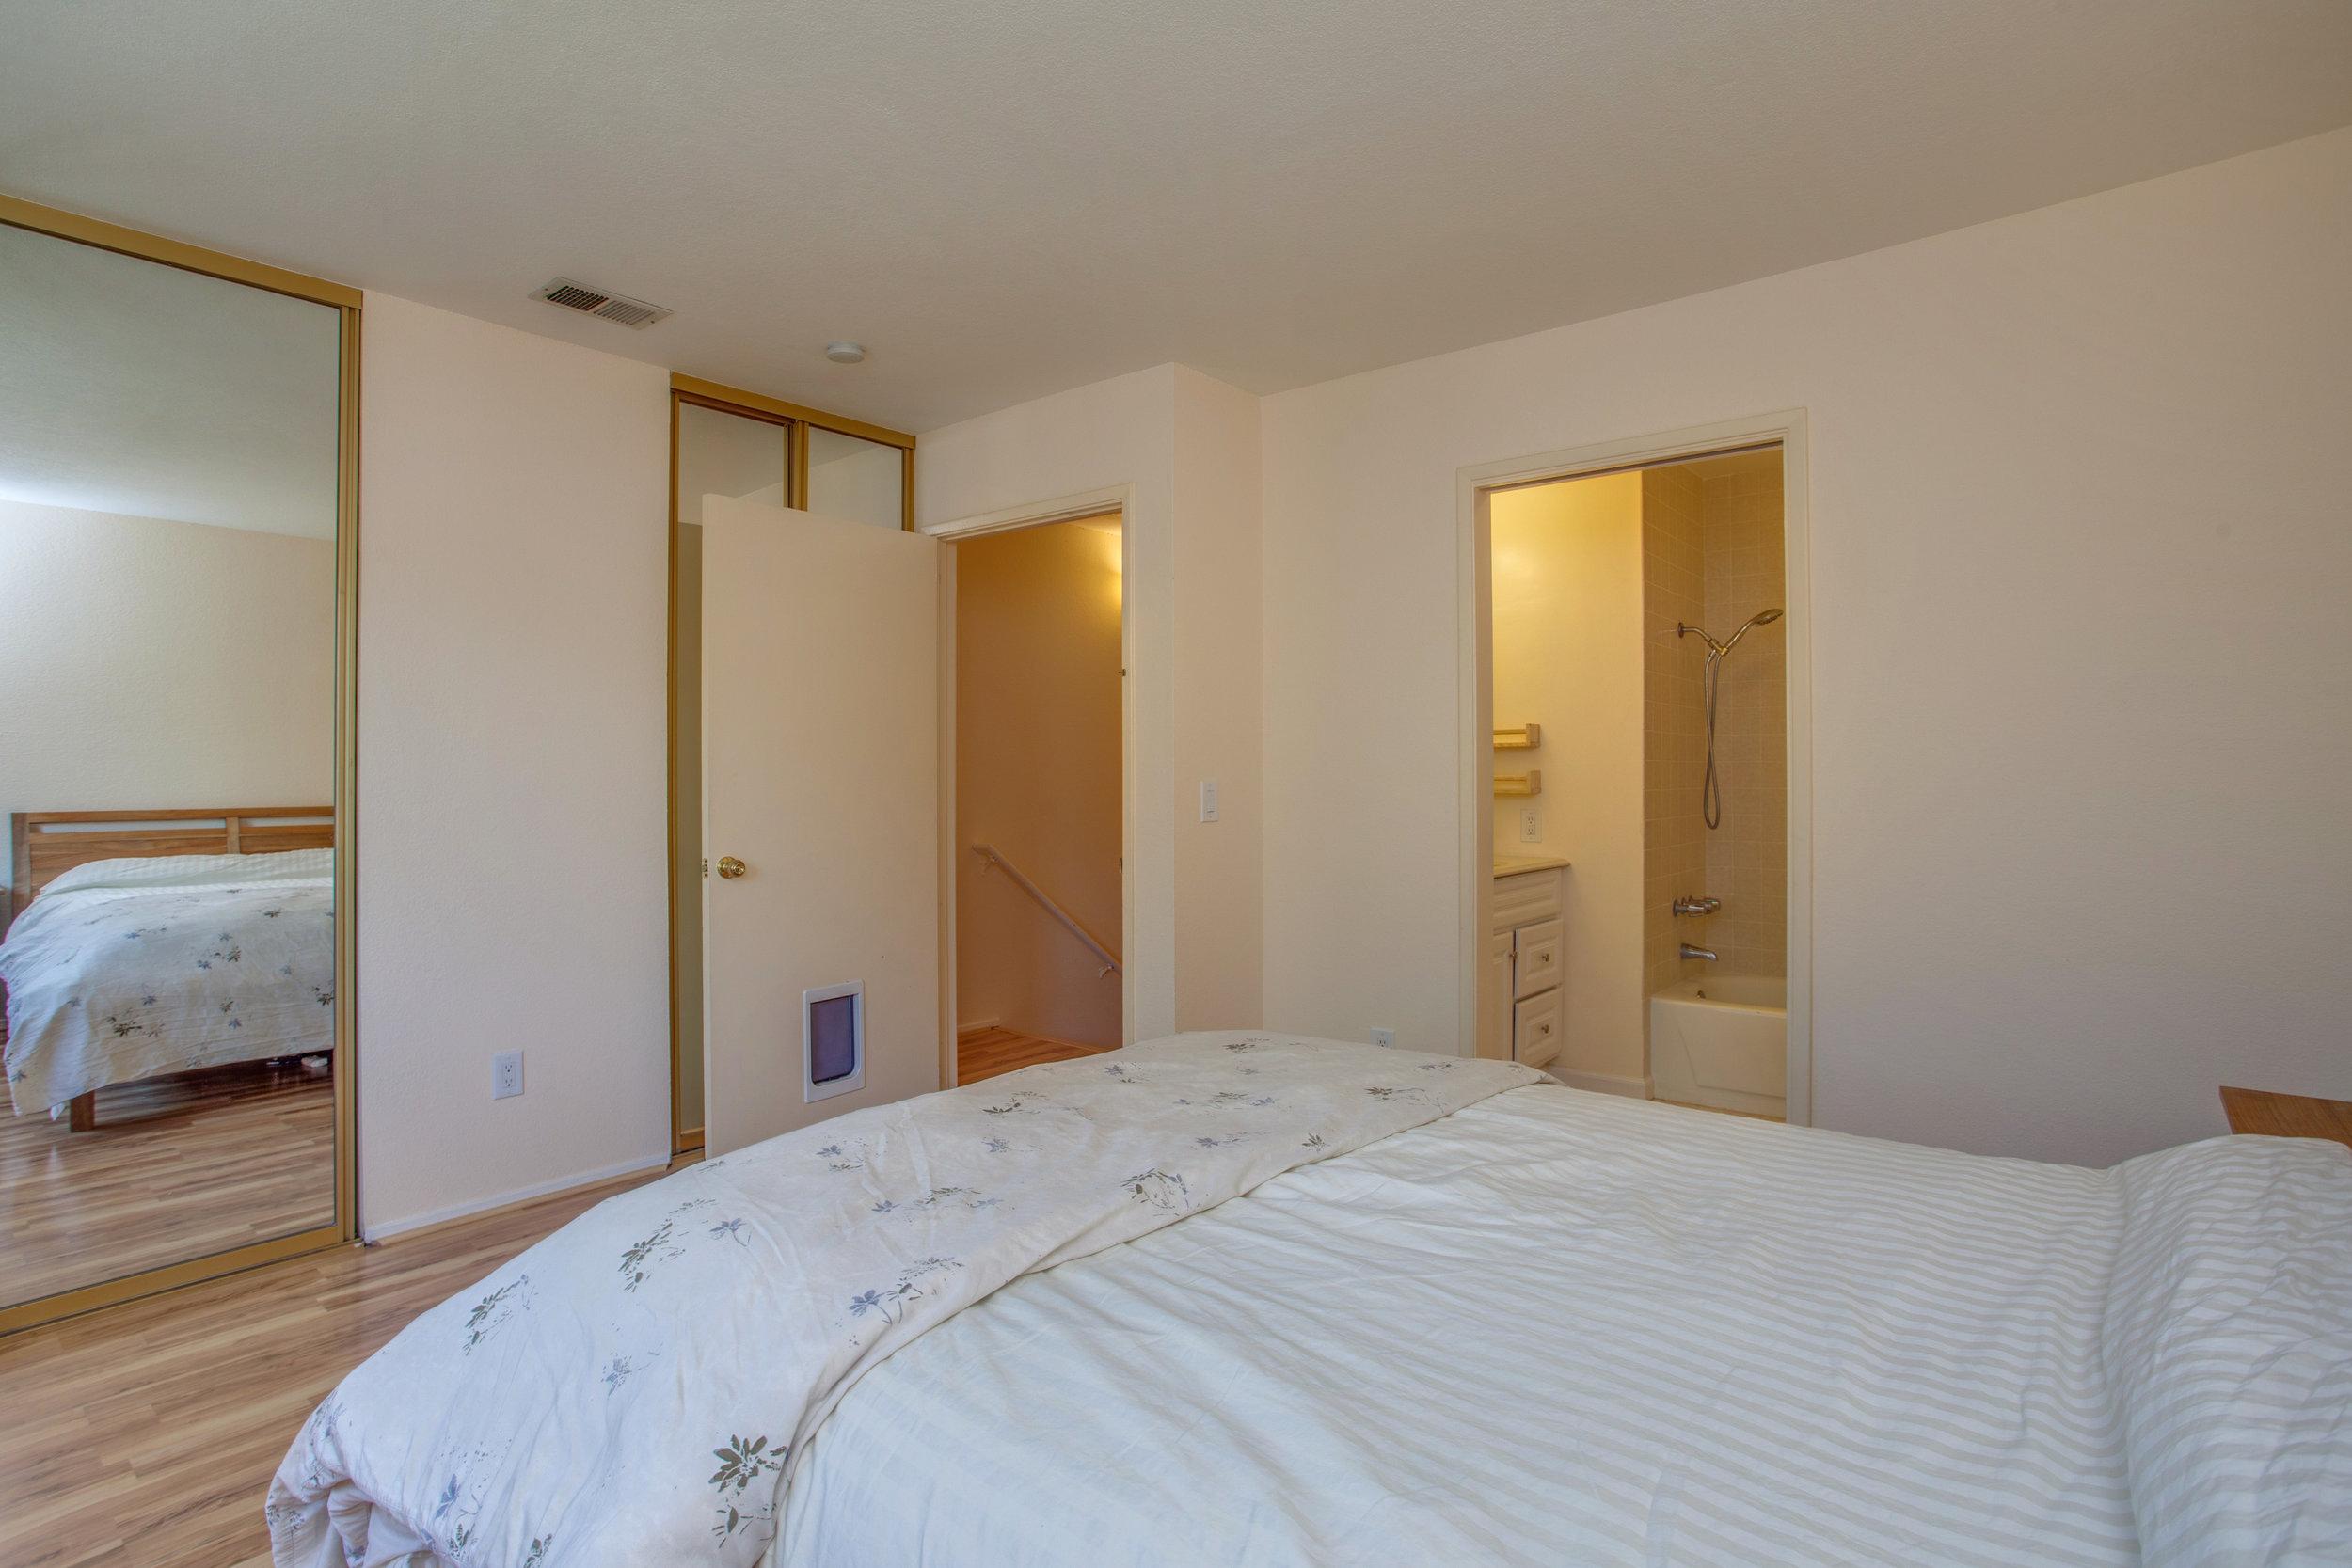 2040_main_street_105_MLS_HID1147580_ROOMbedroom1.jpg